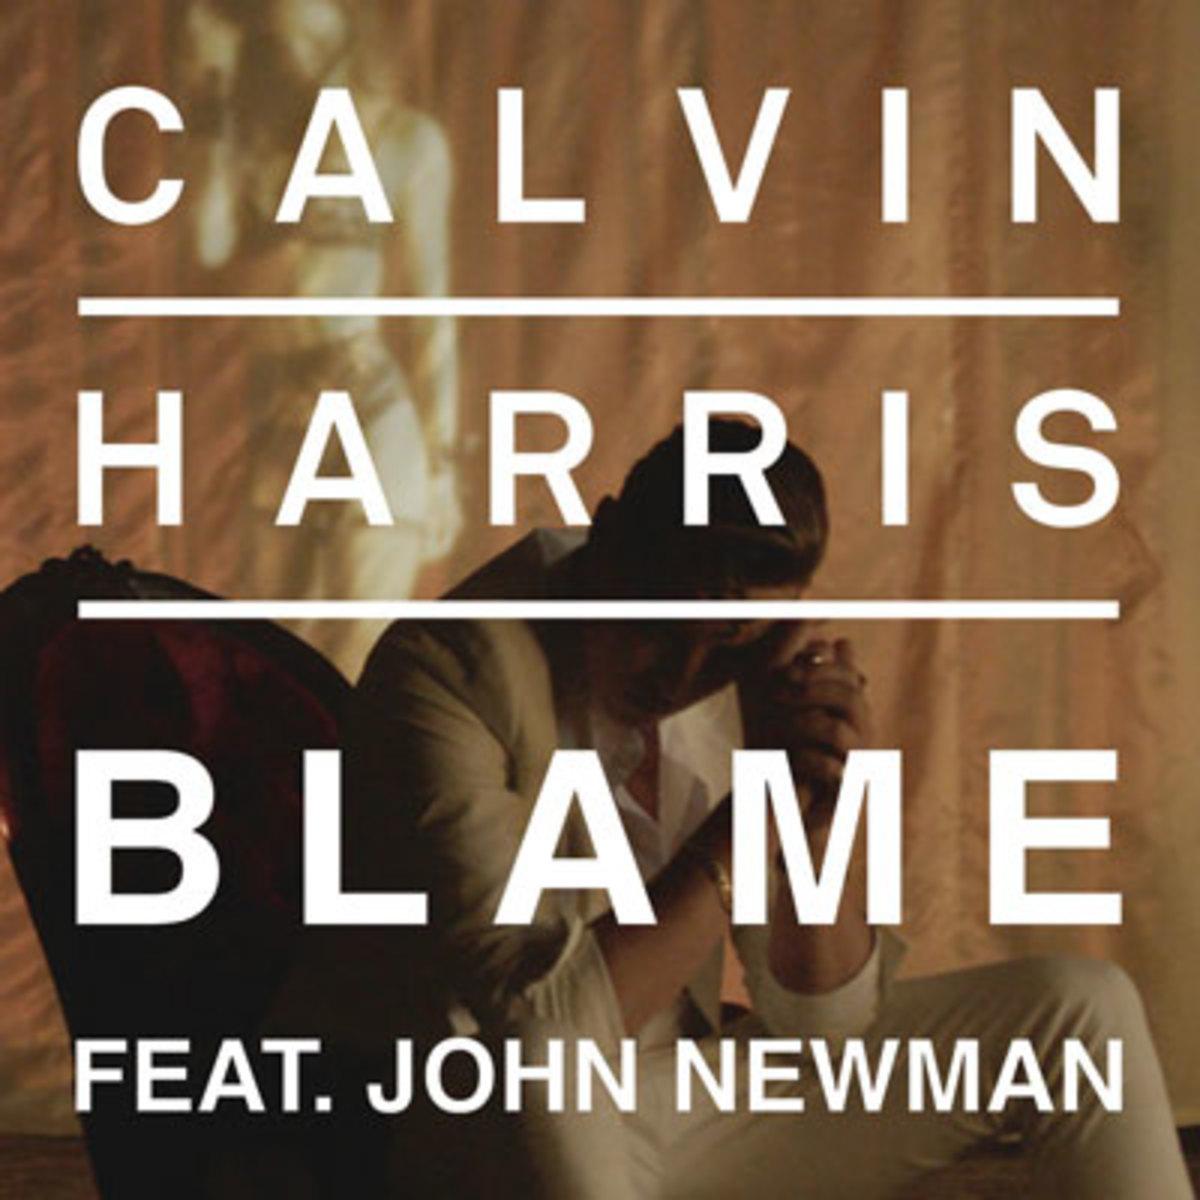 calvinharris-blame.jpg